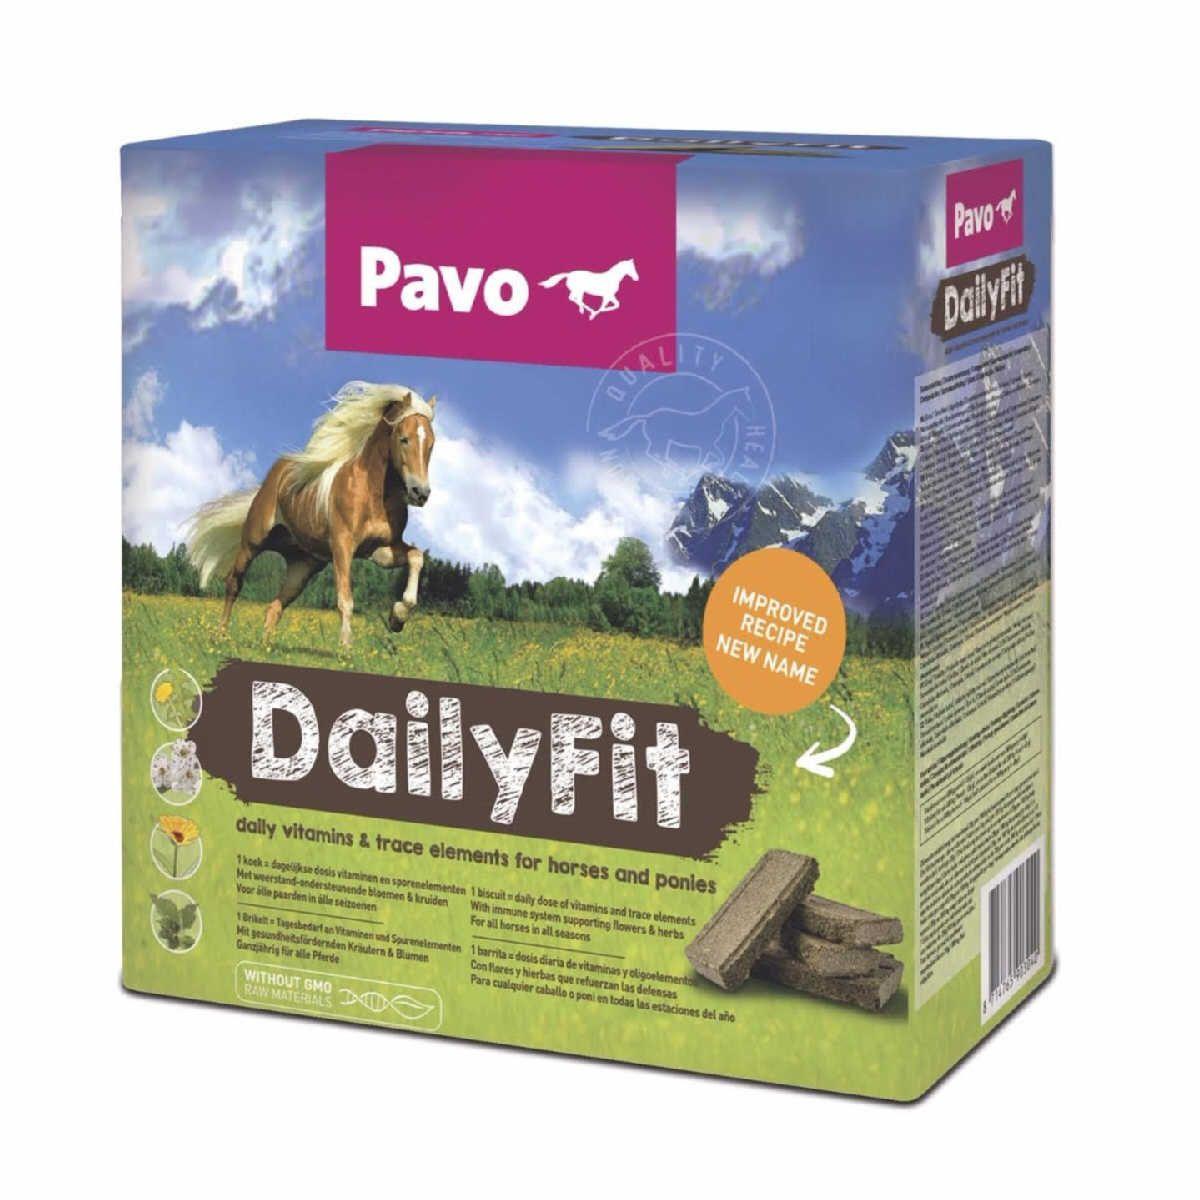 Pavo DailyFit 12.5kg